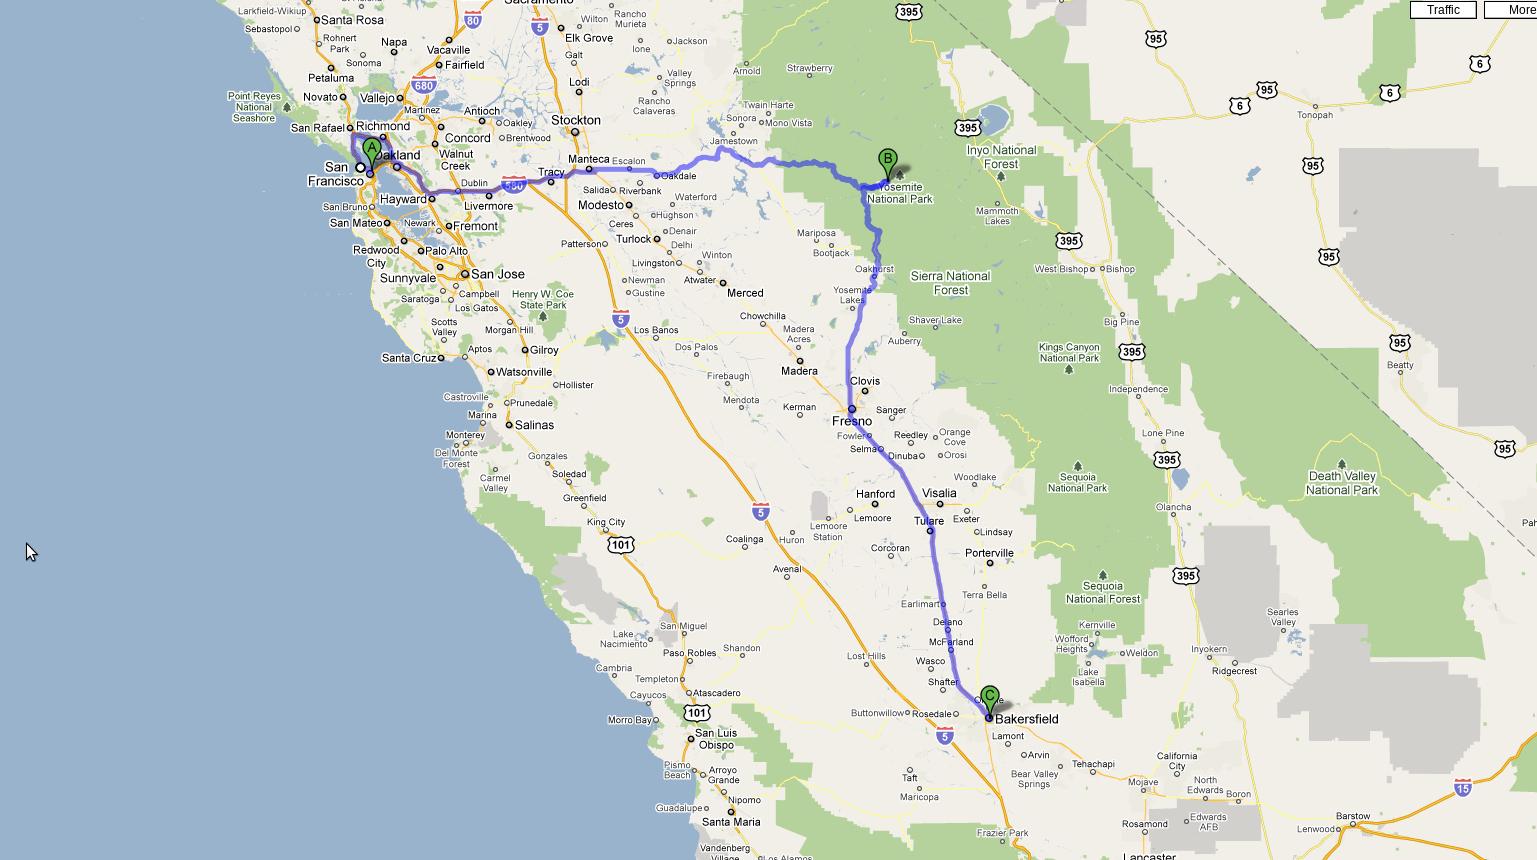 Day Road Maps California Nevada Arizona - Tuquyhai - Road Map Of California And Nevada